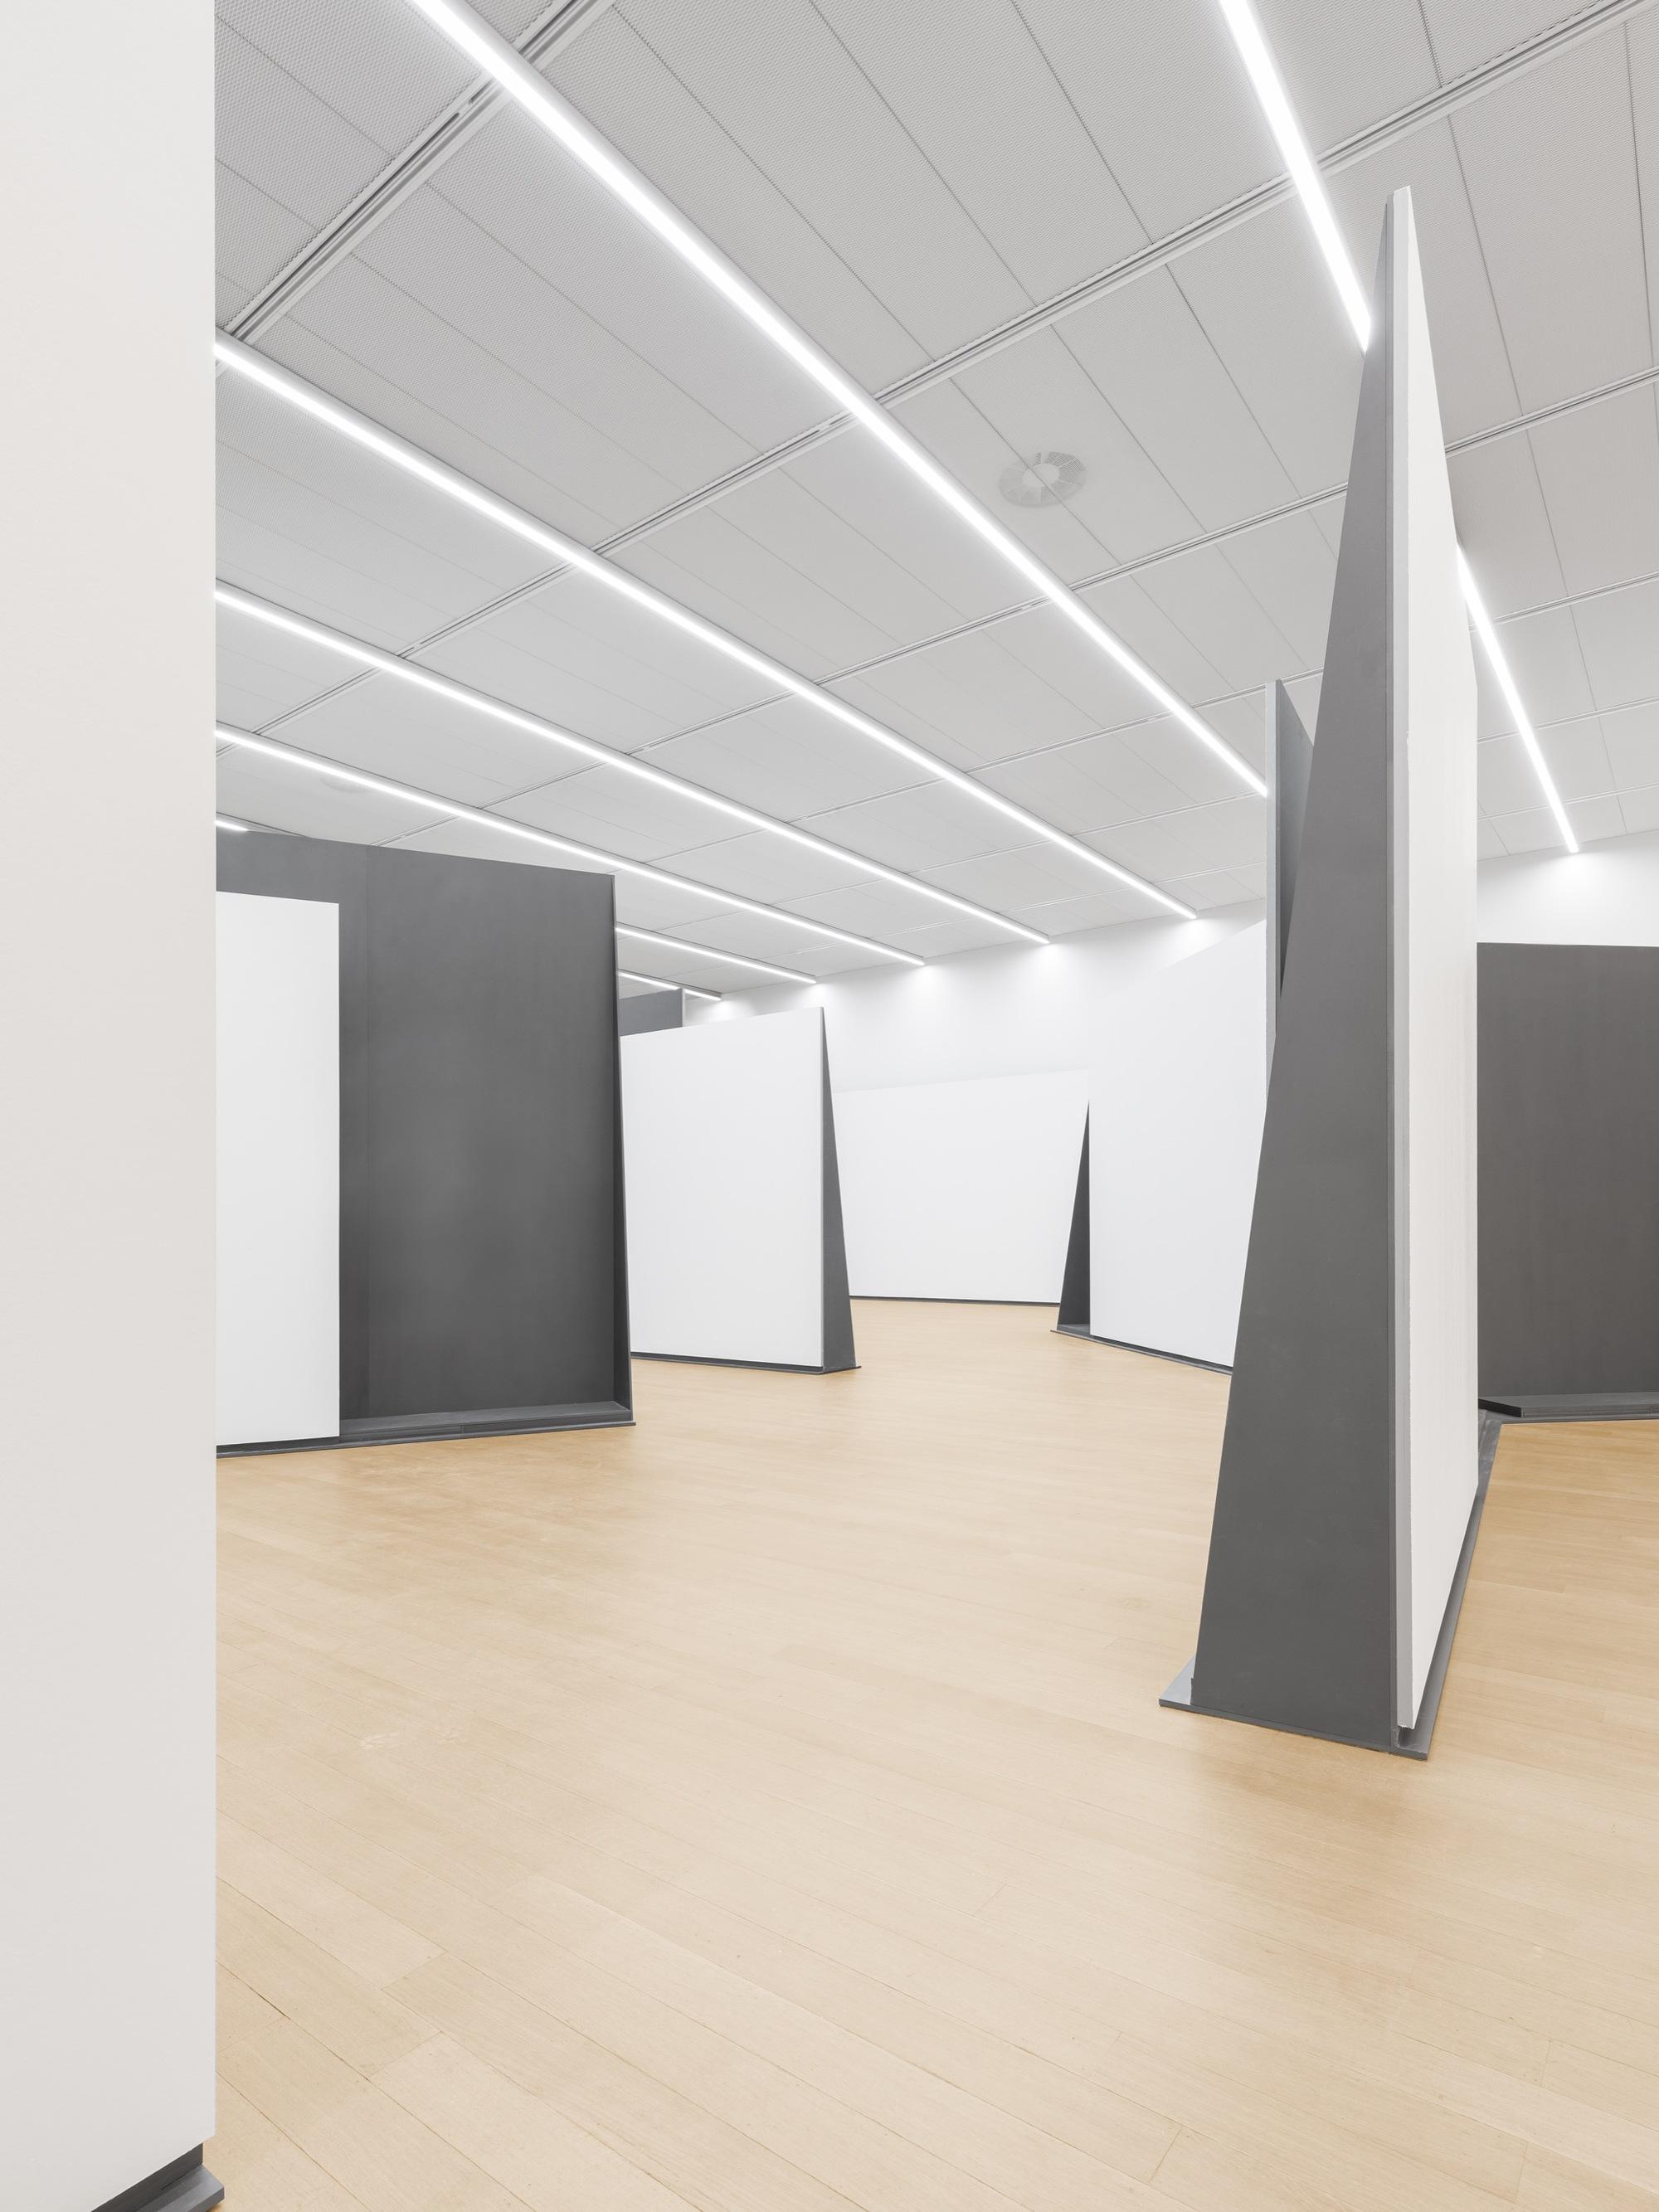 Oma Amo Completes Flexible Permanent Exhibition Space